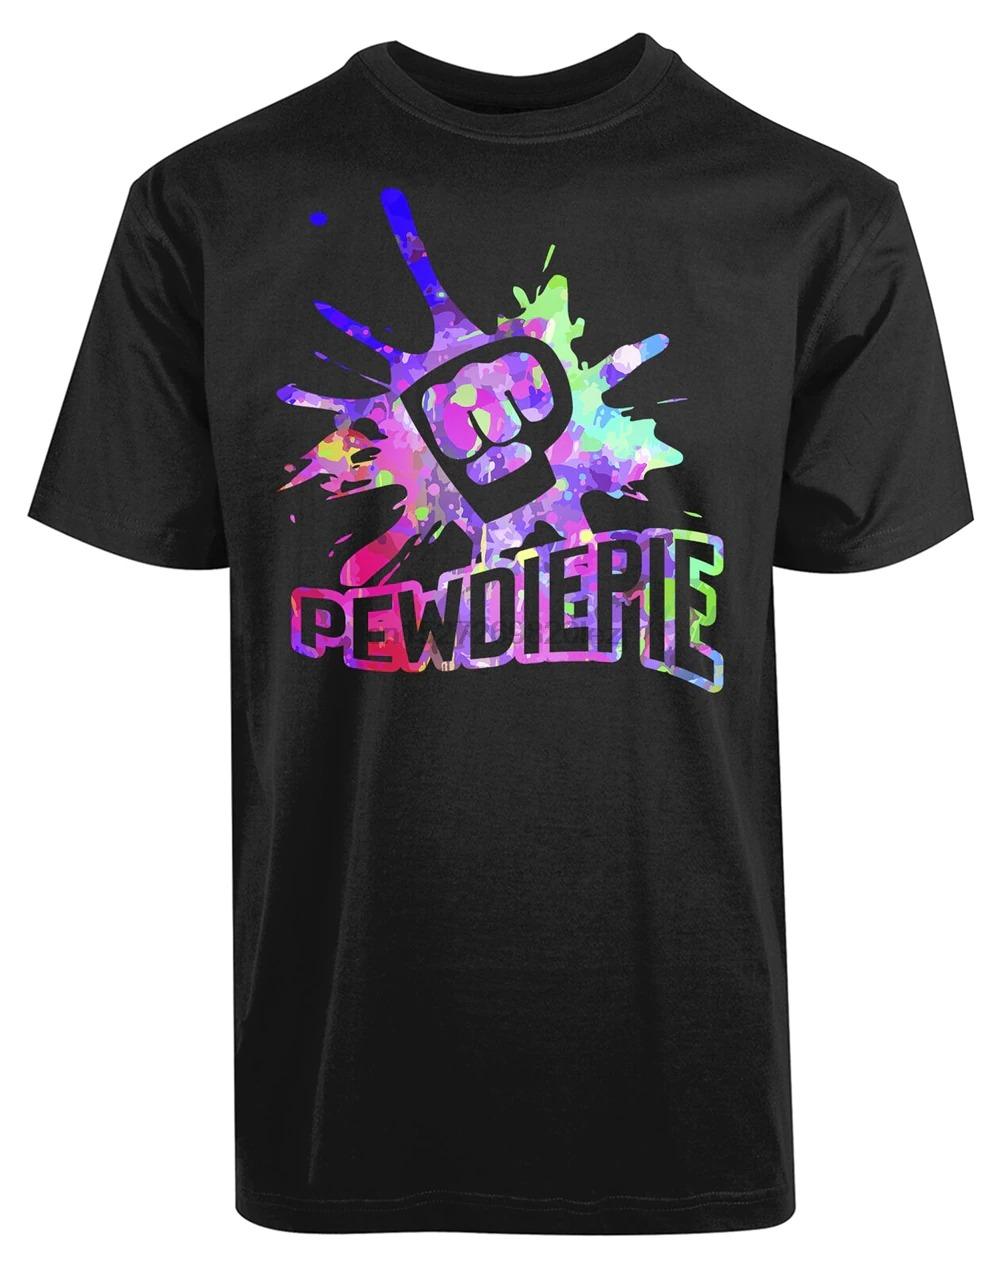 pewdiepie colorful printed logo black t shirt 6399 - PewDiePie Merch